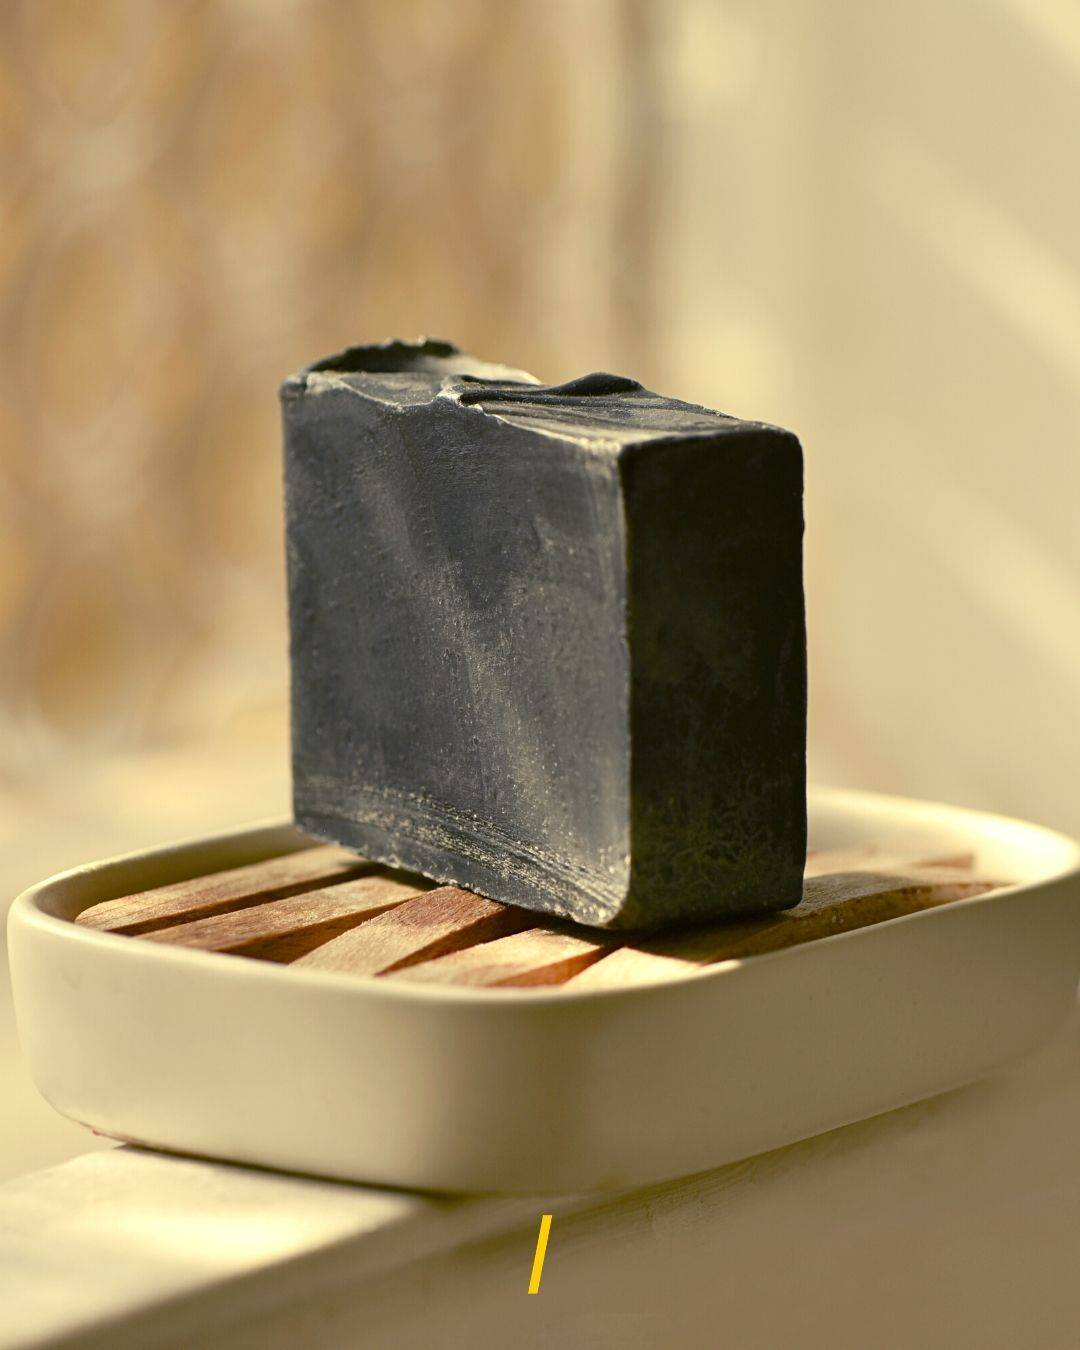 Le savon solide purifiant - Shiloe